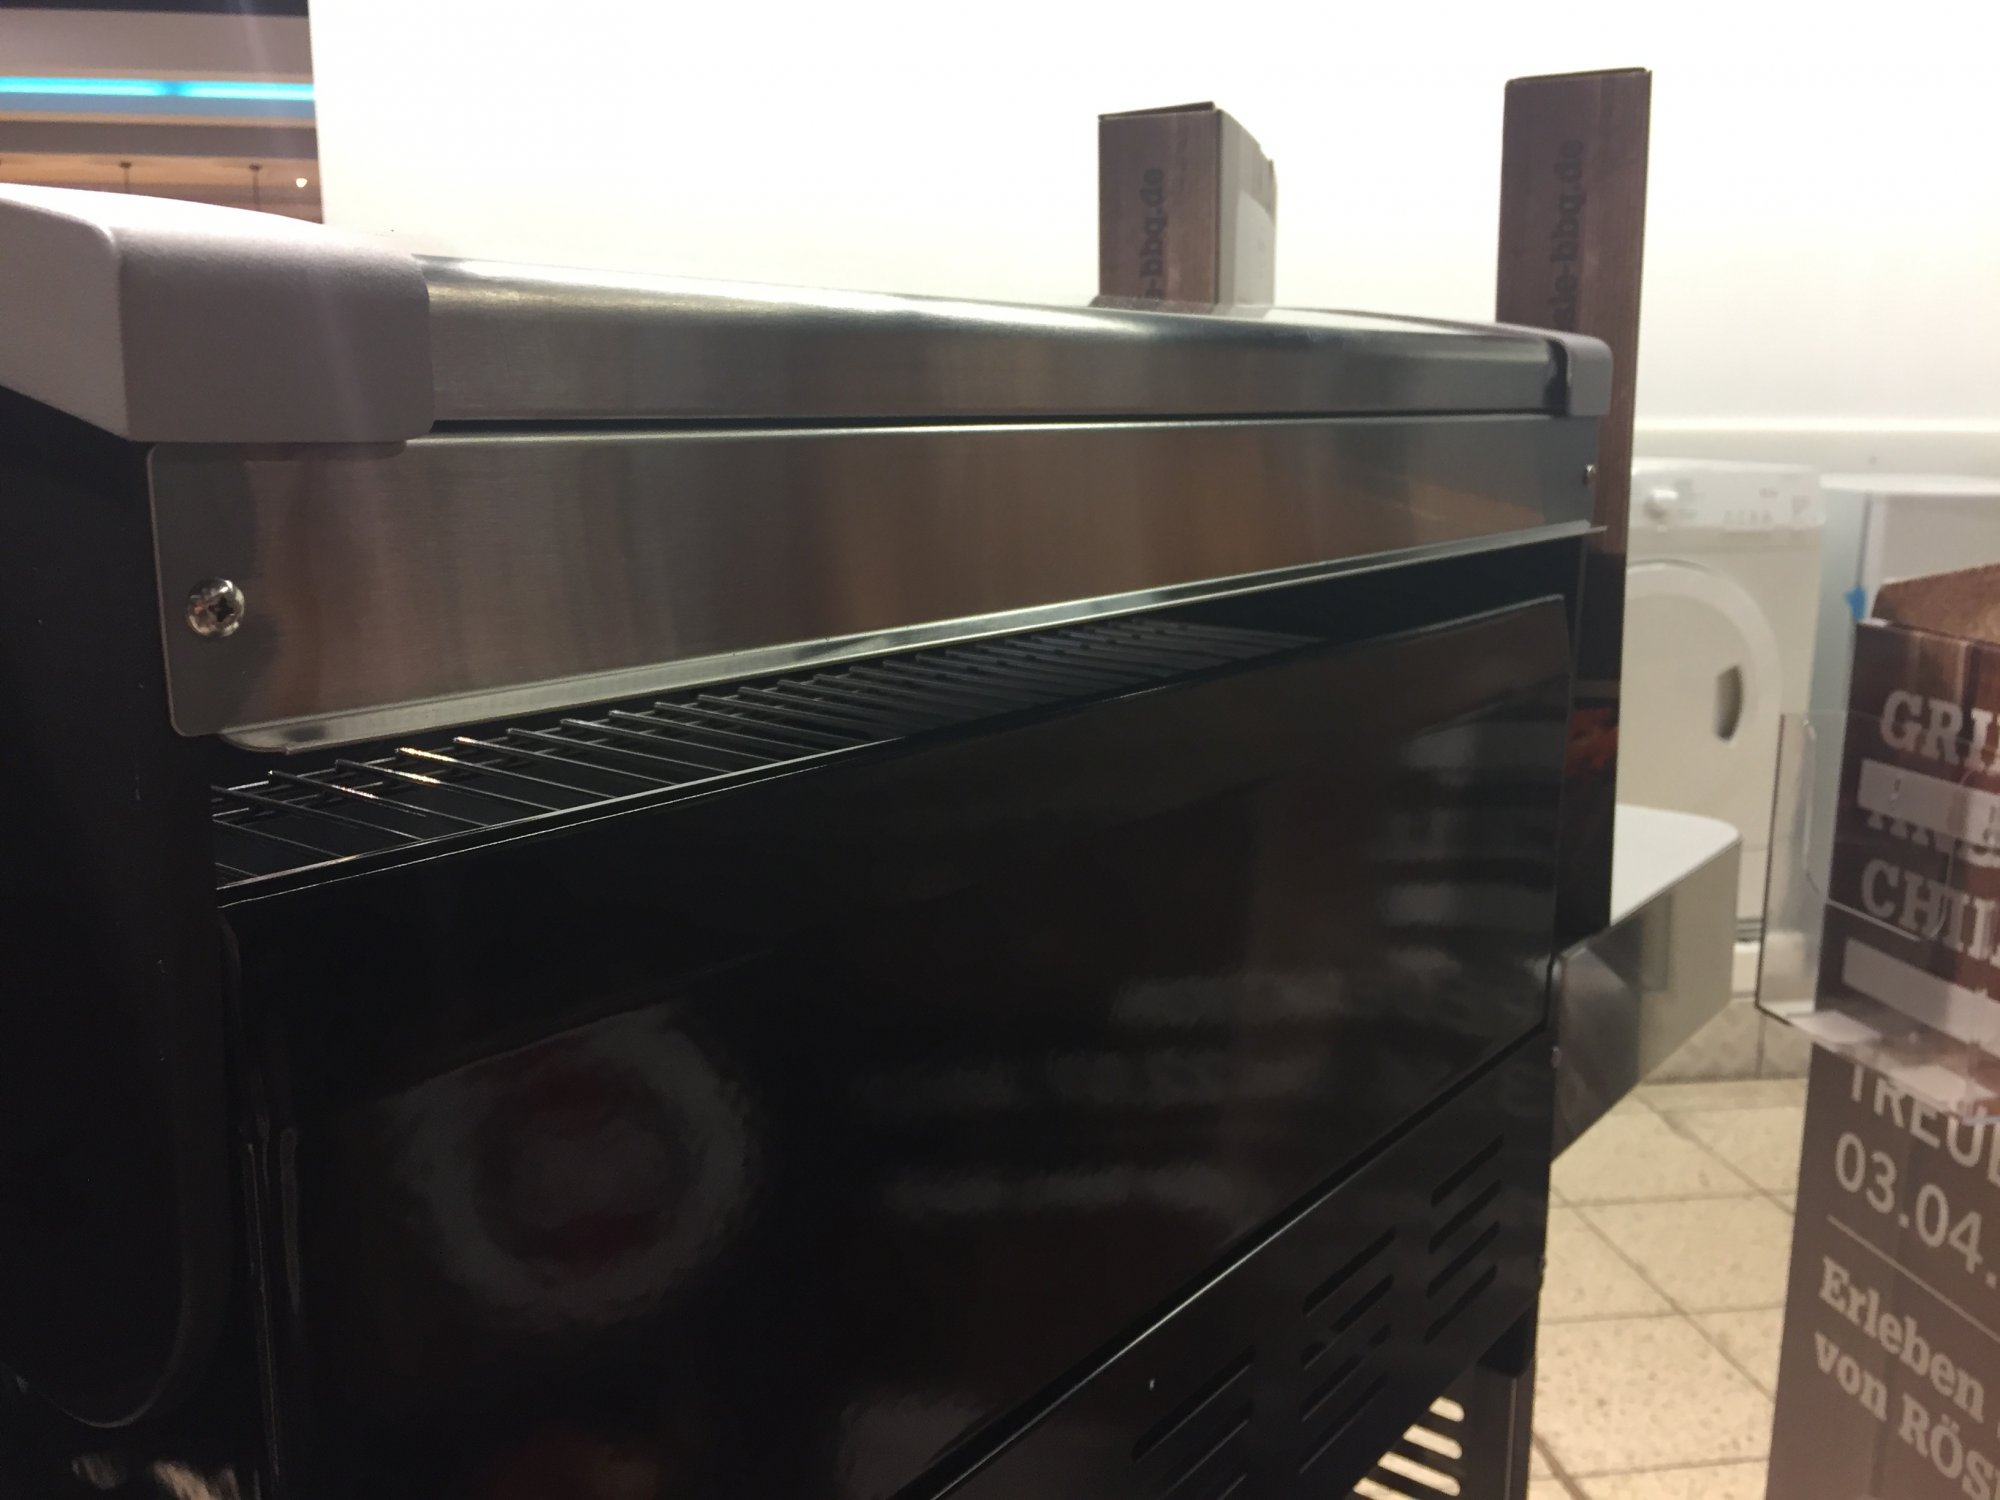 Rösle Gasgrill G3 Edeka : Rösle bbq station gourmet g edelstahl für gasgrillanfängerin